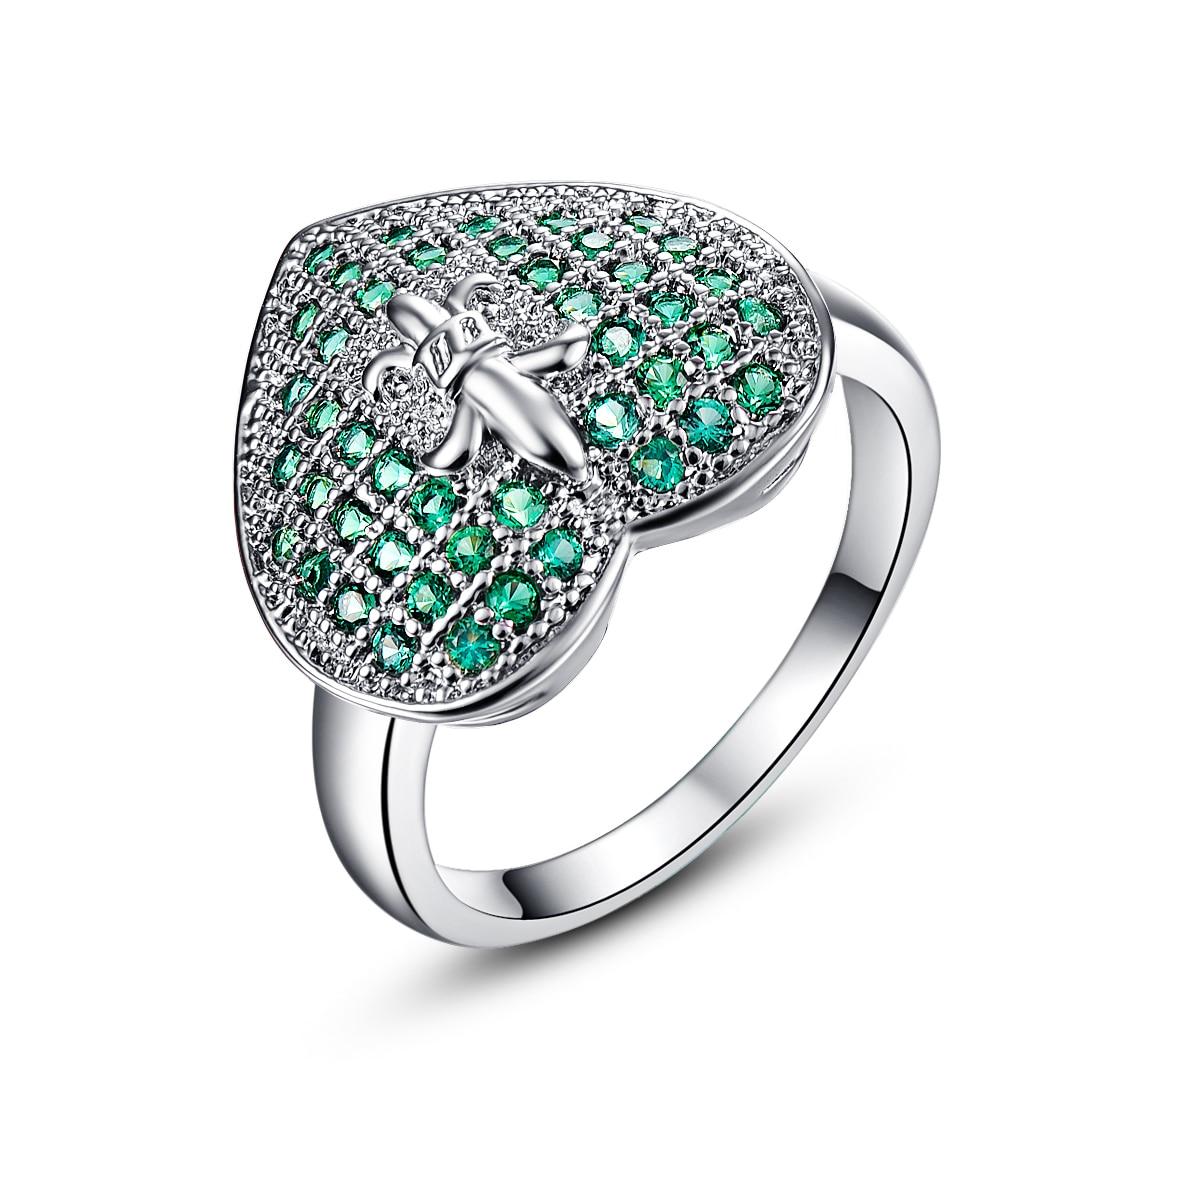 Lingmei Silver Plated font b Ring b font Ocean Hearts Green Created Emerald Crystal Heart Cut